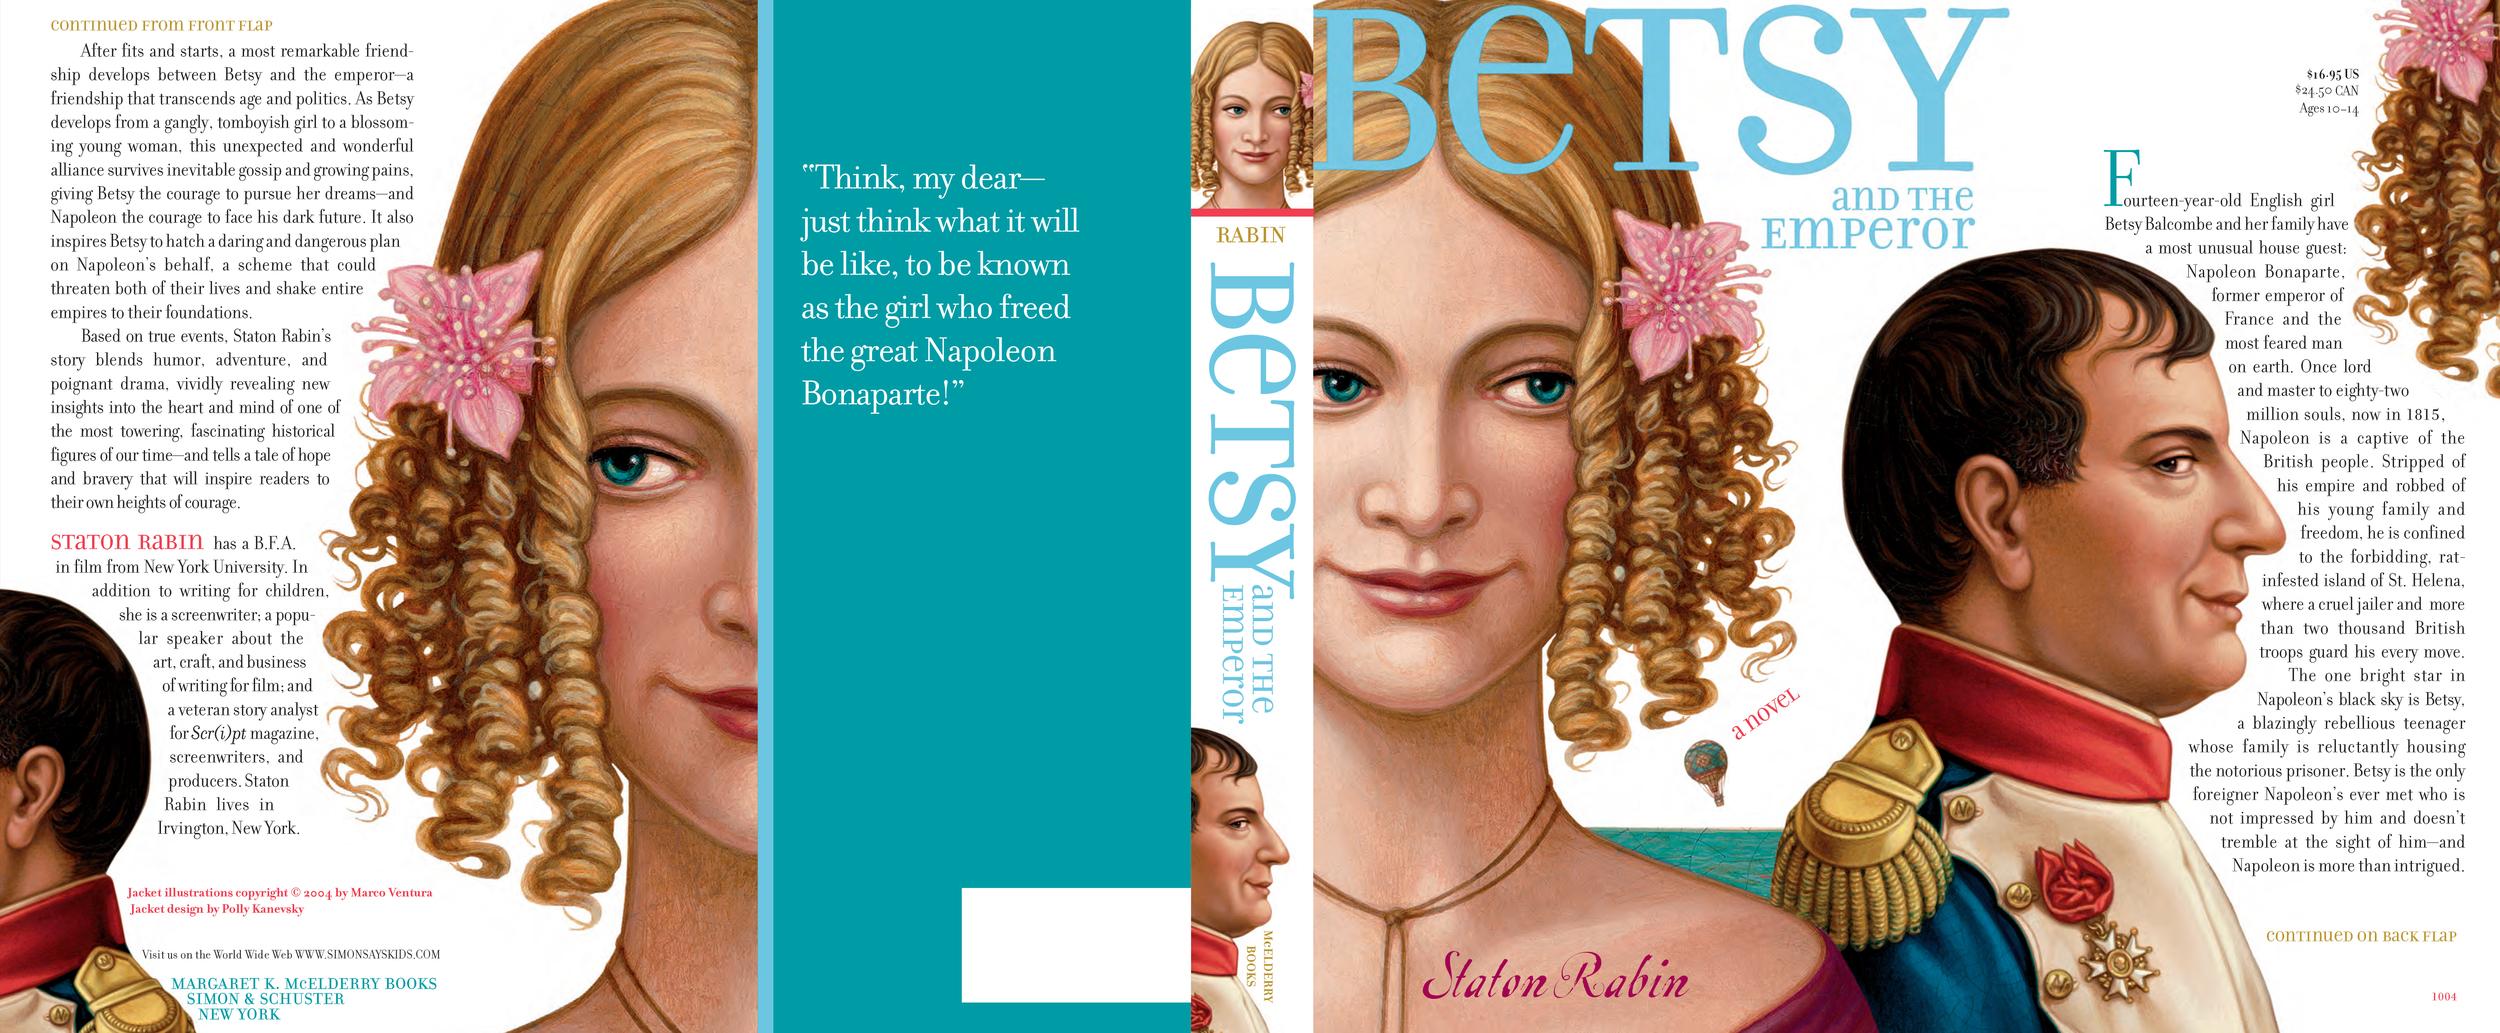 Betsy and the Emperor.Simon & Schuster.Novel Jacket.jpg